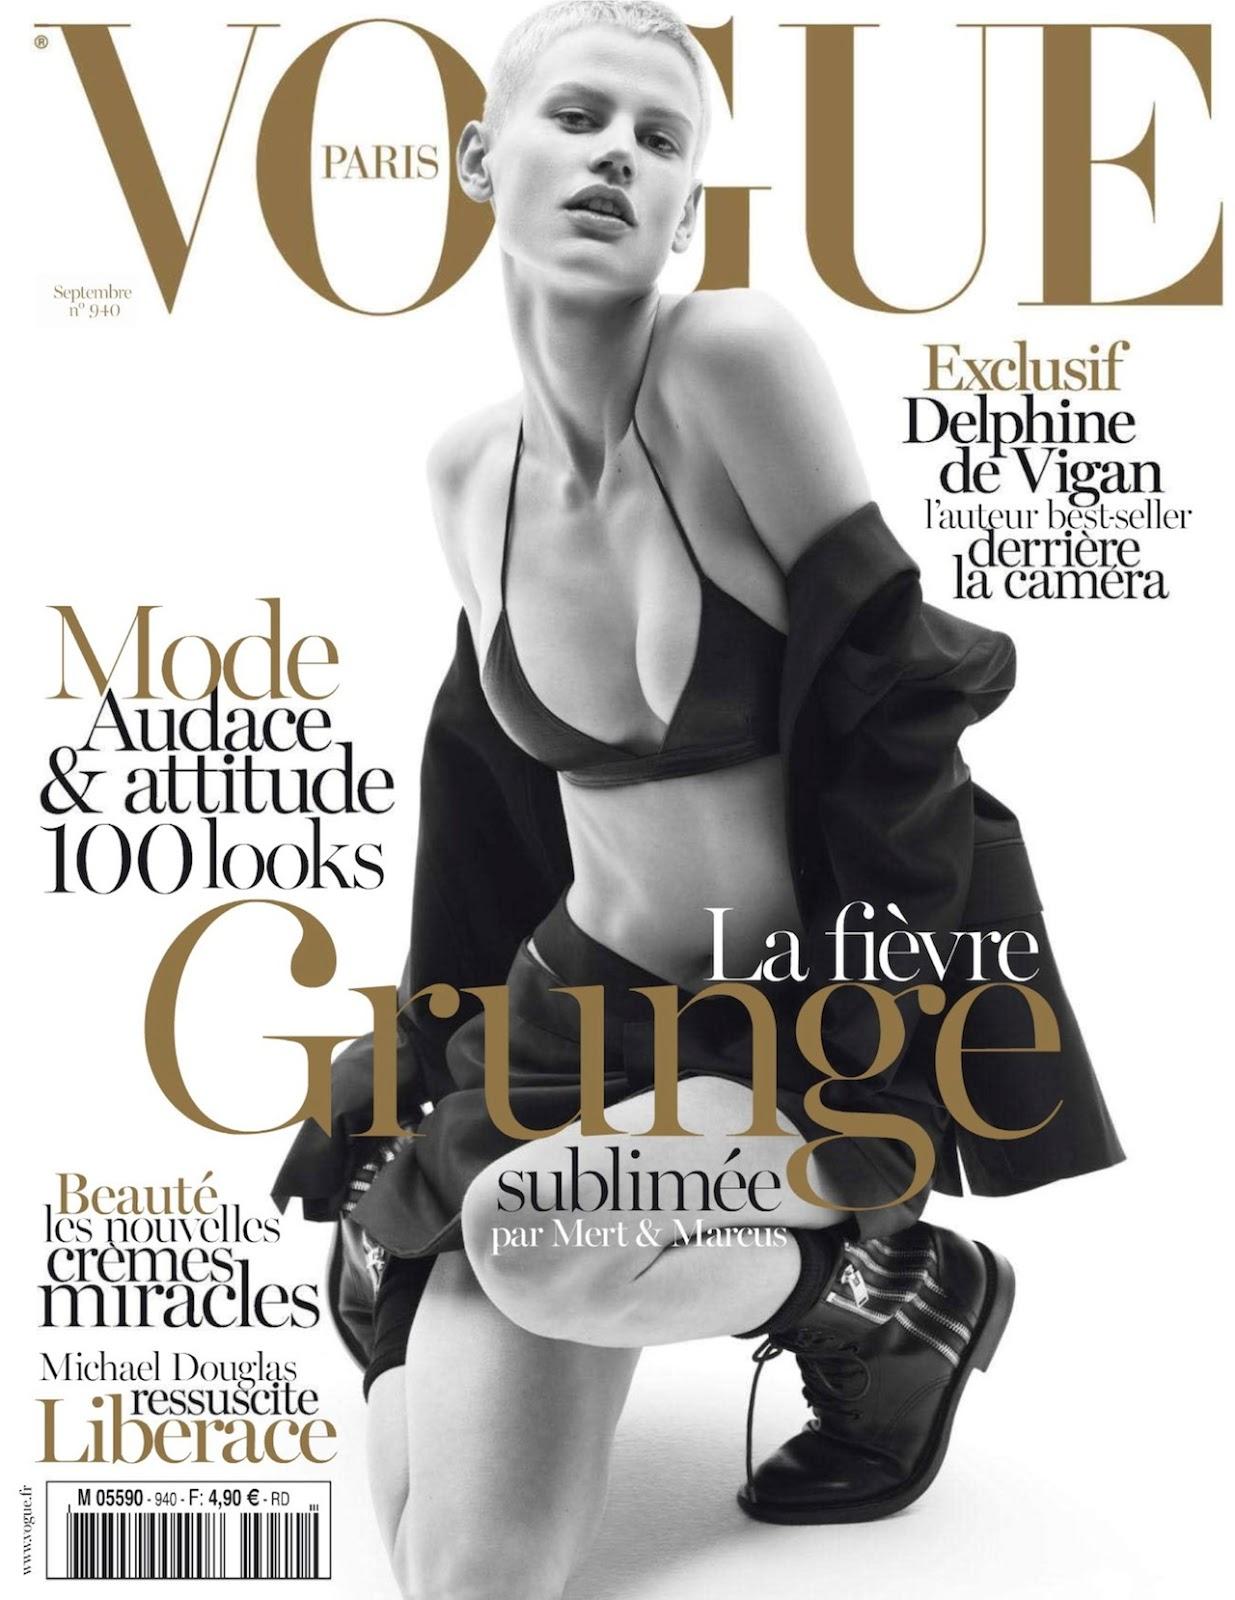 vogue-paris-2013-septembre-dragged.jpg